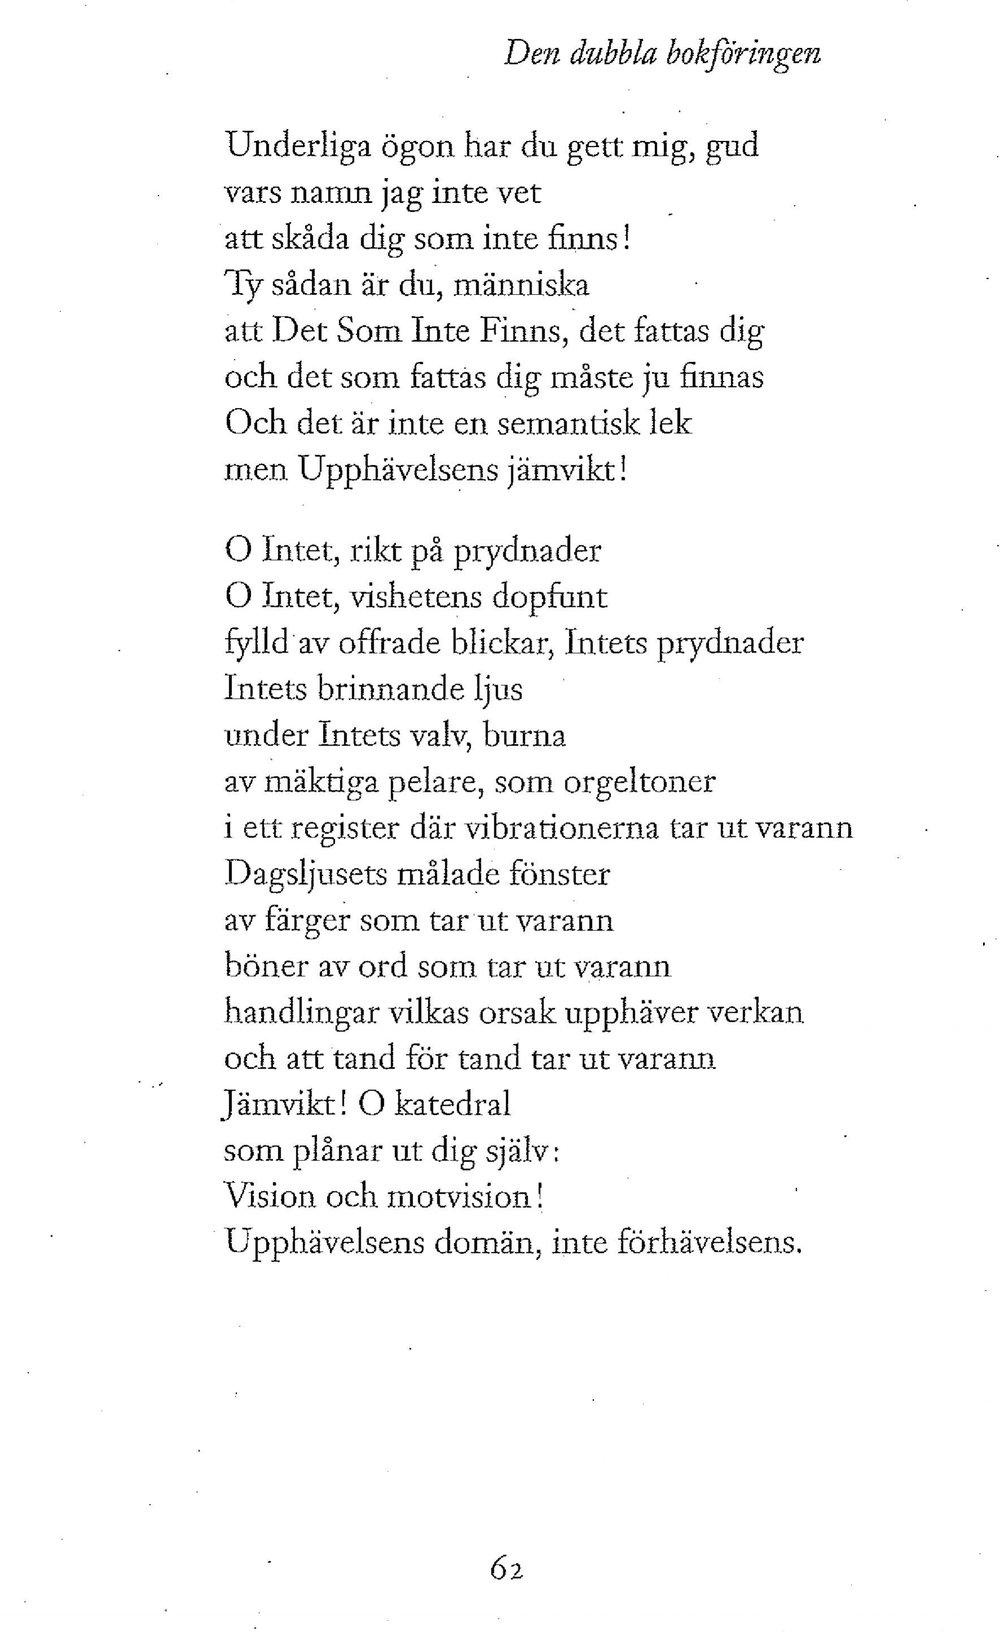 Gunnar Ekelöf, Samlade dikter II, 2017,s. 62